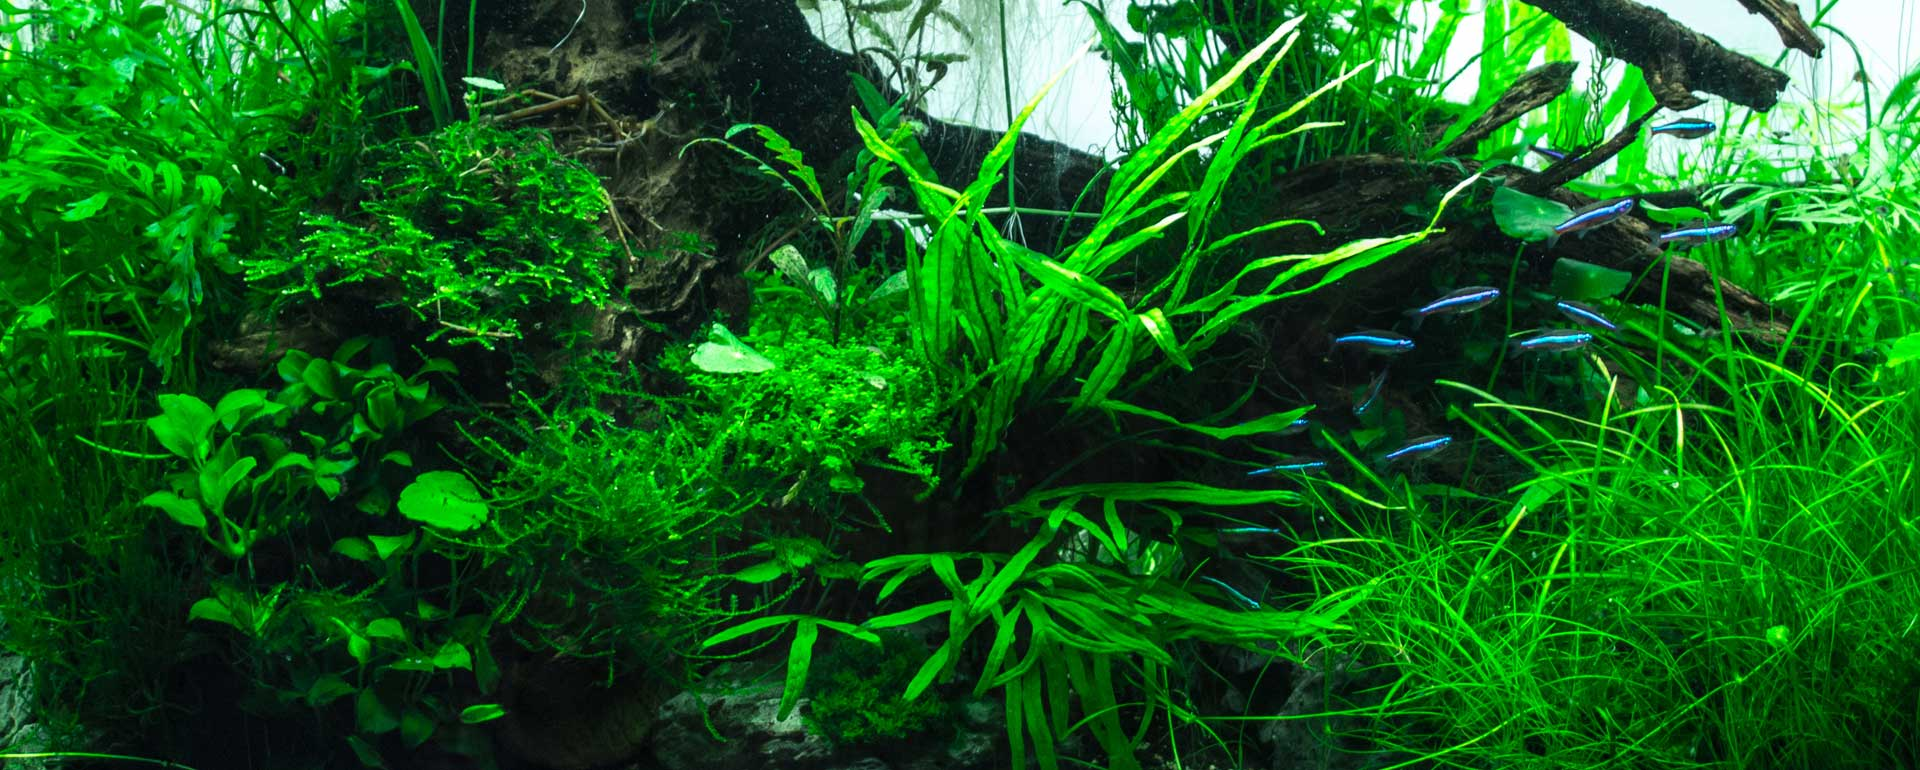 pantallas led acuario